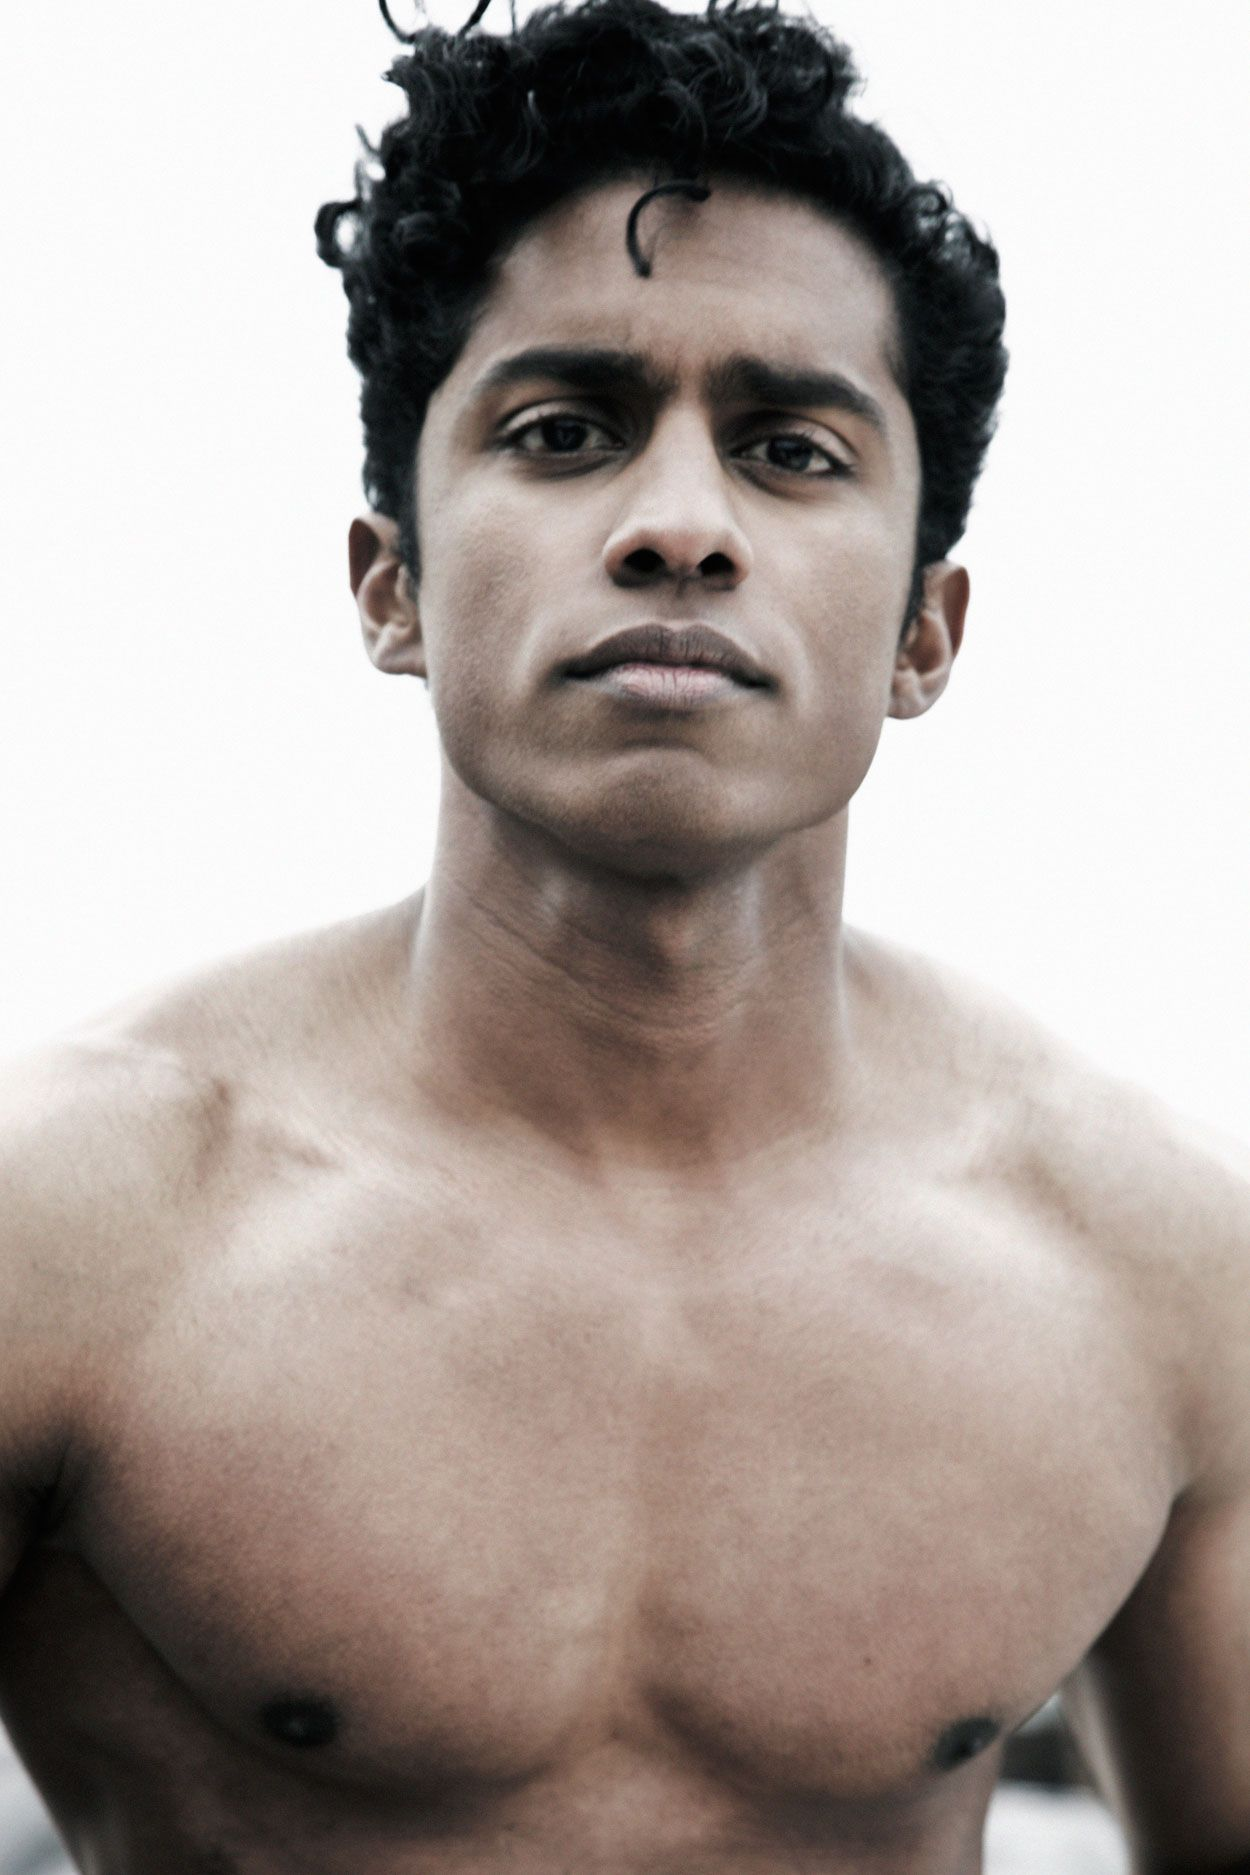 Rajiv Surendra naked (41 photo), Topless, Hot, Selfie, panties 2017